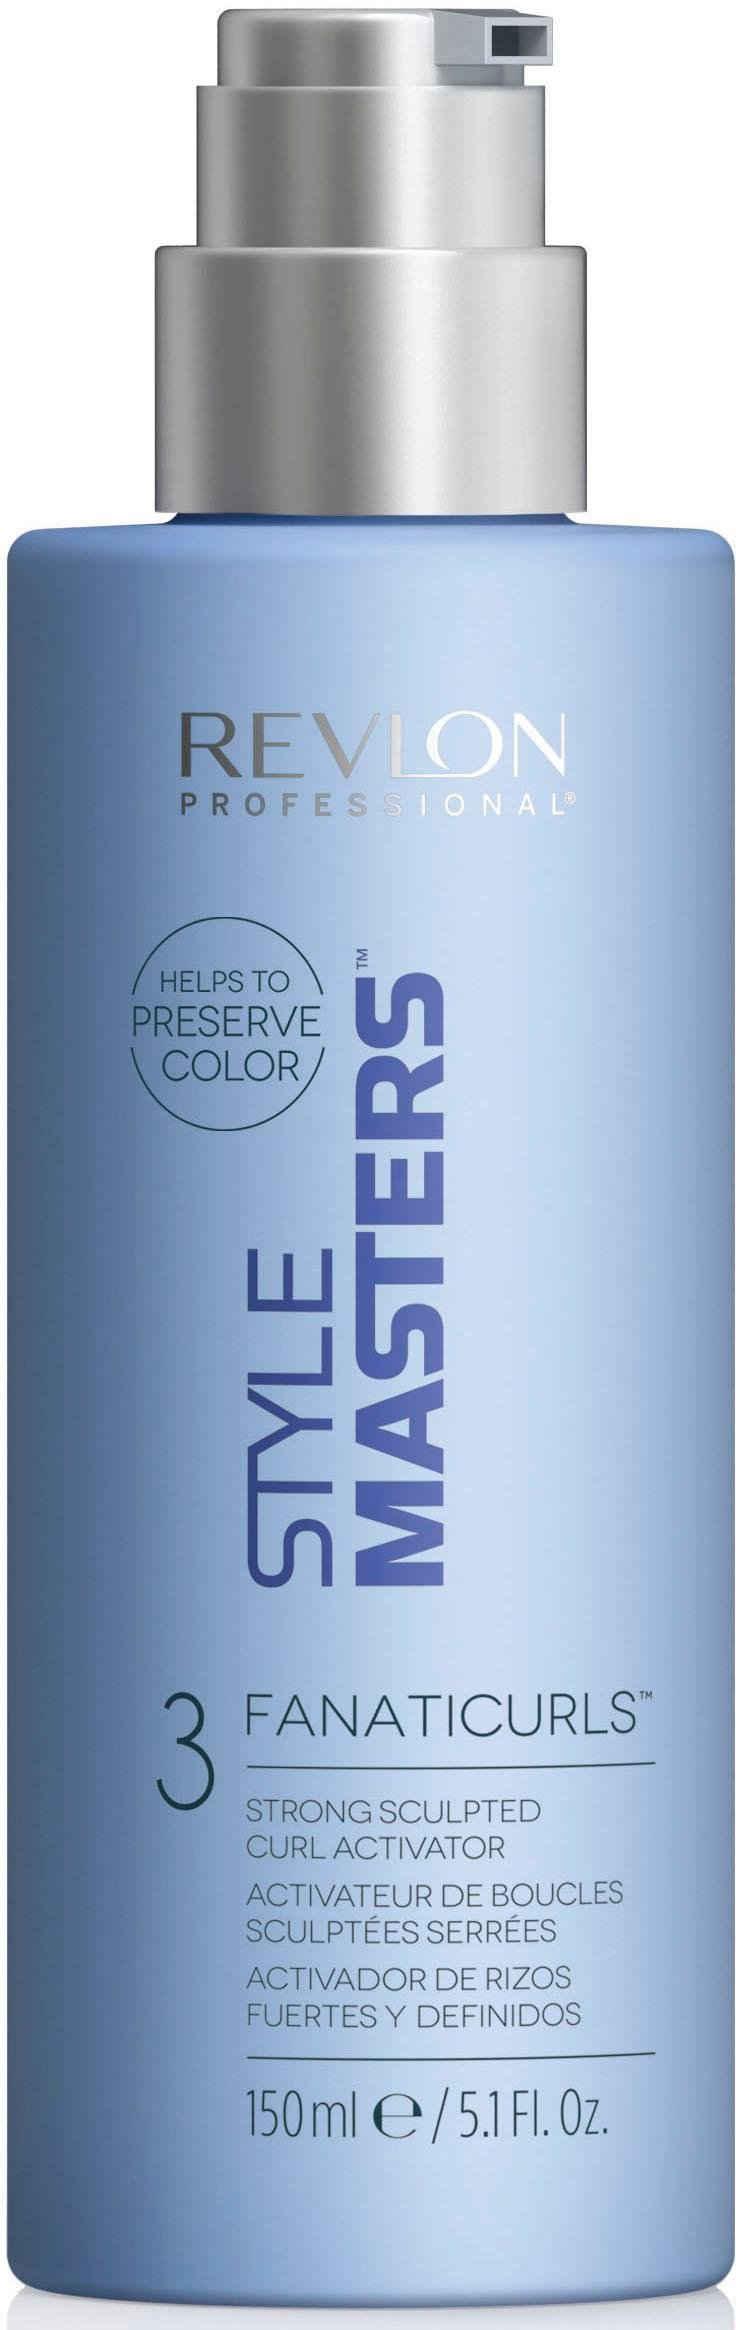 REVLON PROFESSIONAL Styling-Creme »Style Masters Fanaticurls Curl Activator«, definierte Locken